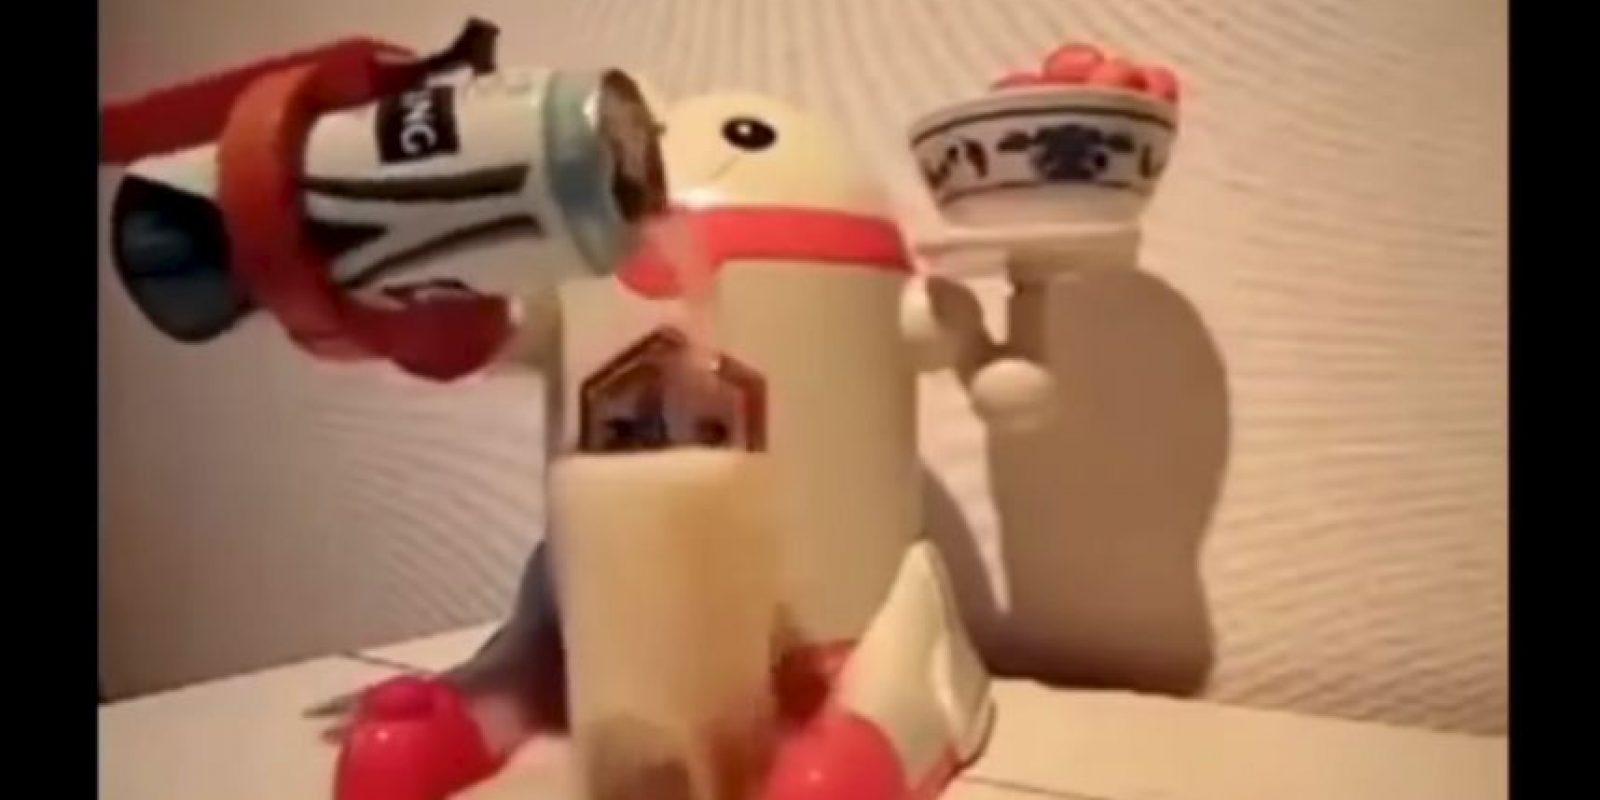 Este robot mesero se deshizo mientras servia refresco Foto:Youtube/Master Haku